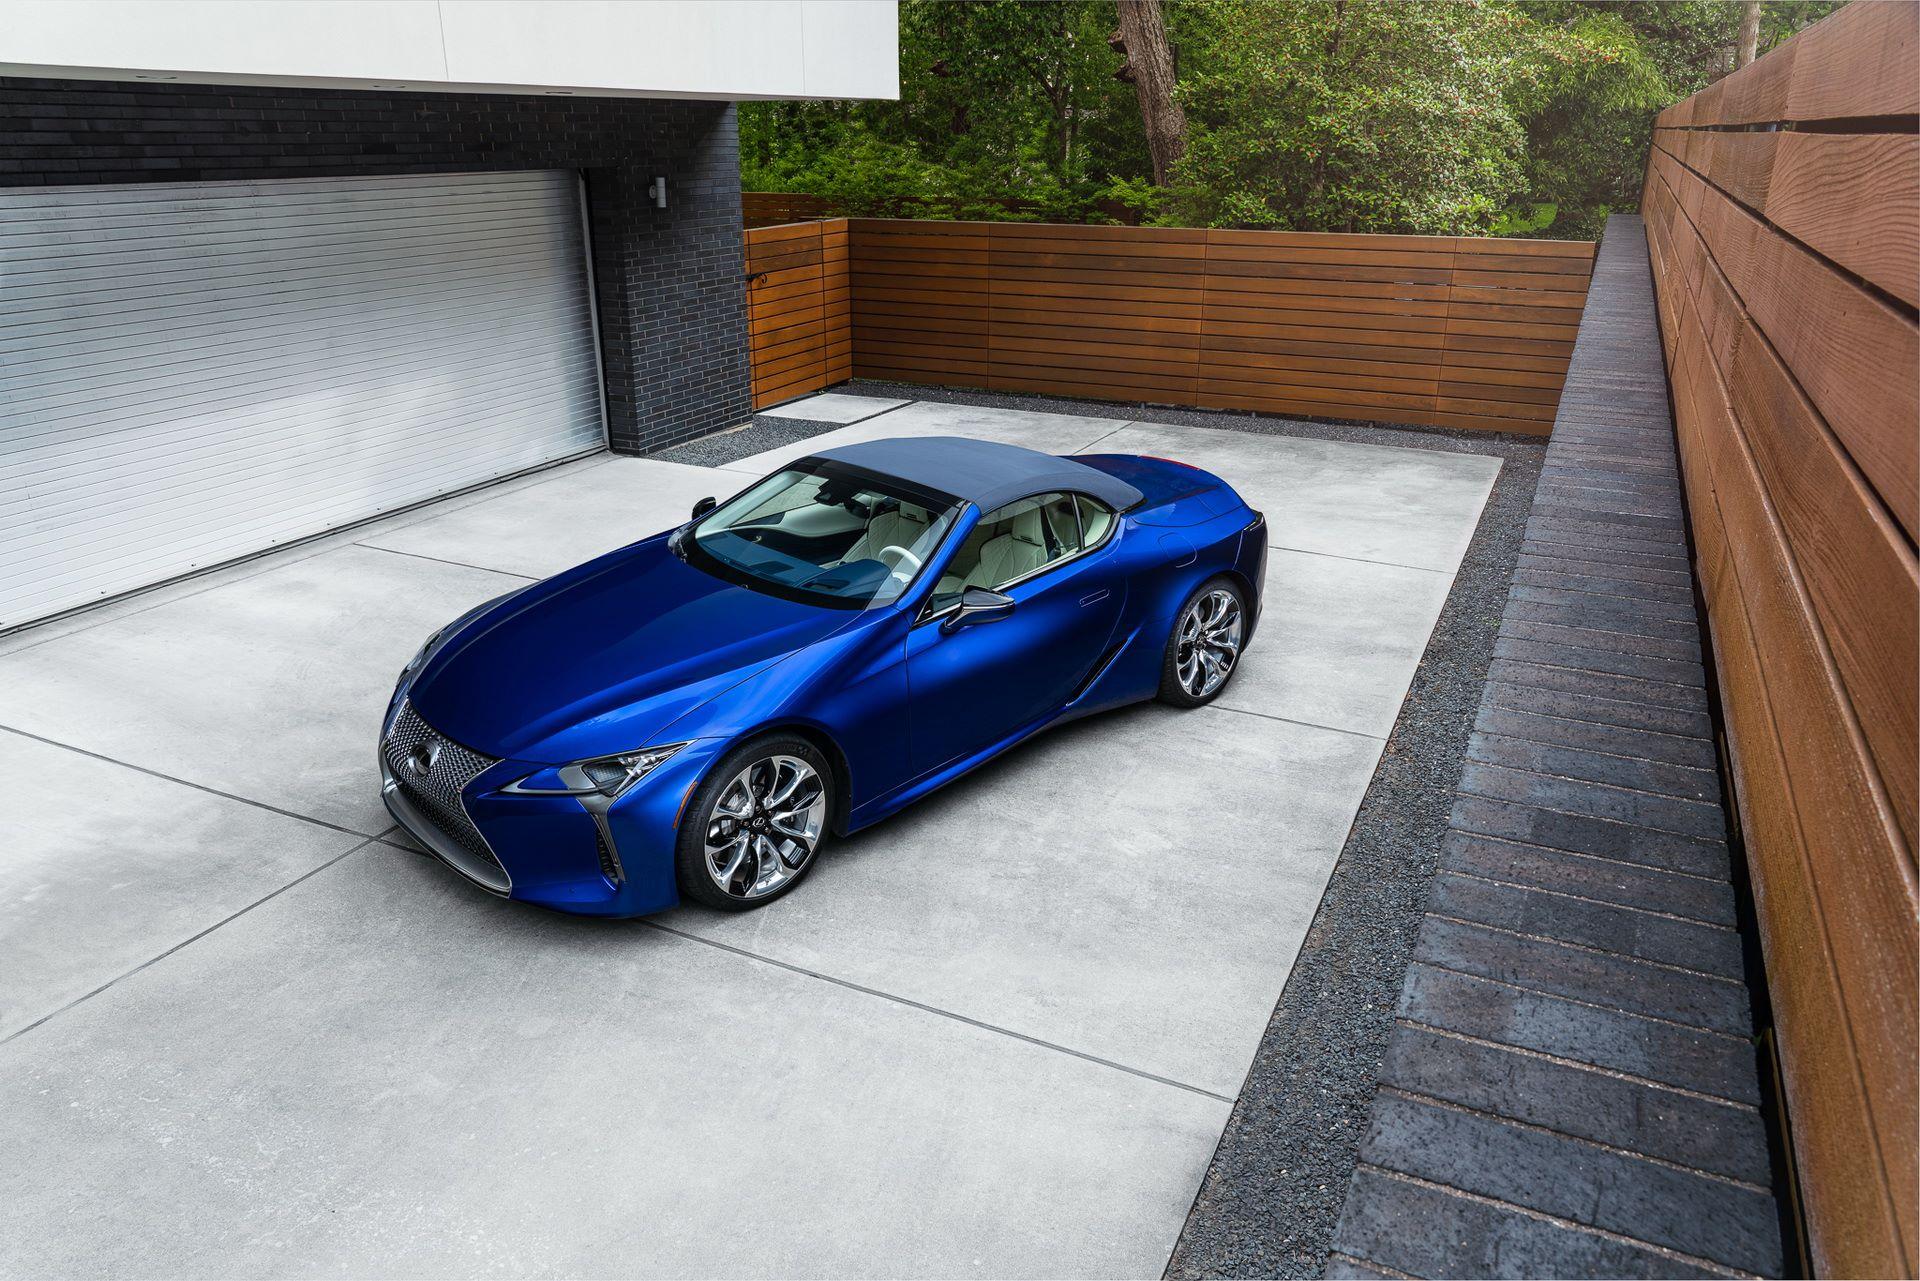 Lexus-LC-500-Convertible-Regatta-Edition-2